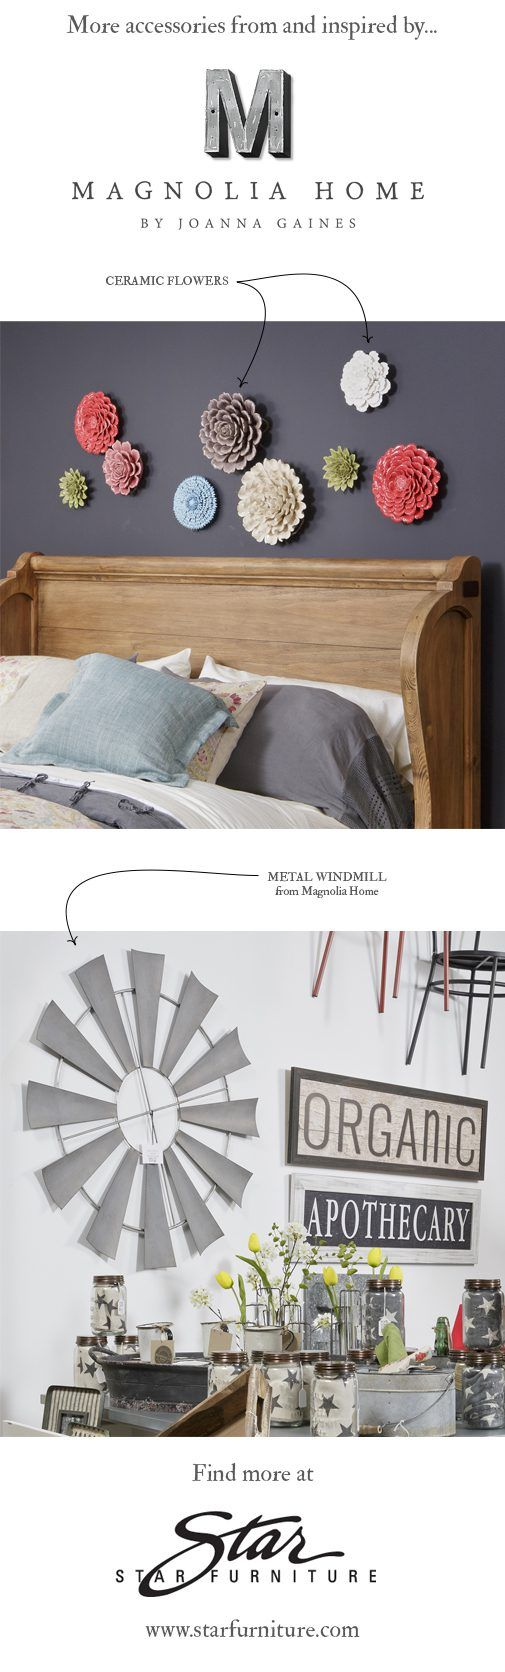 24 best magnolia home furniture u0026 accessories by joanna gaines